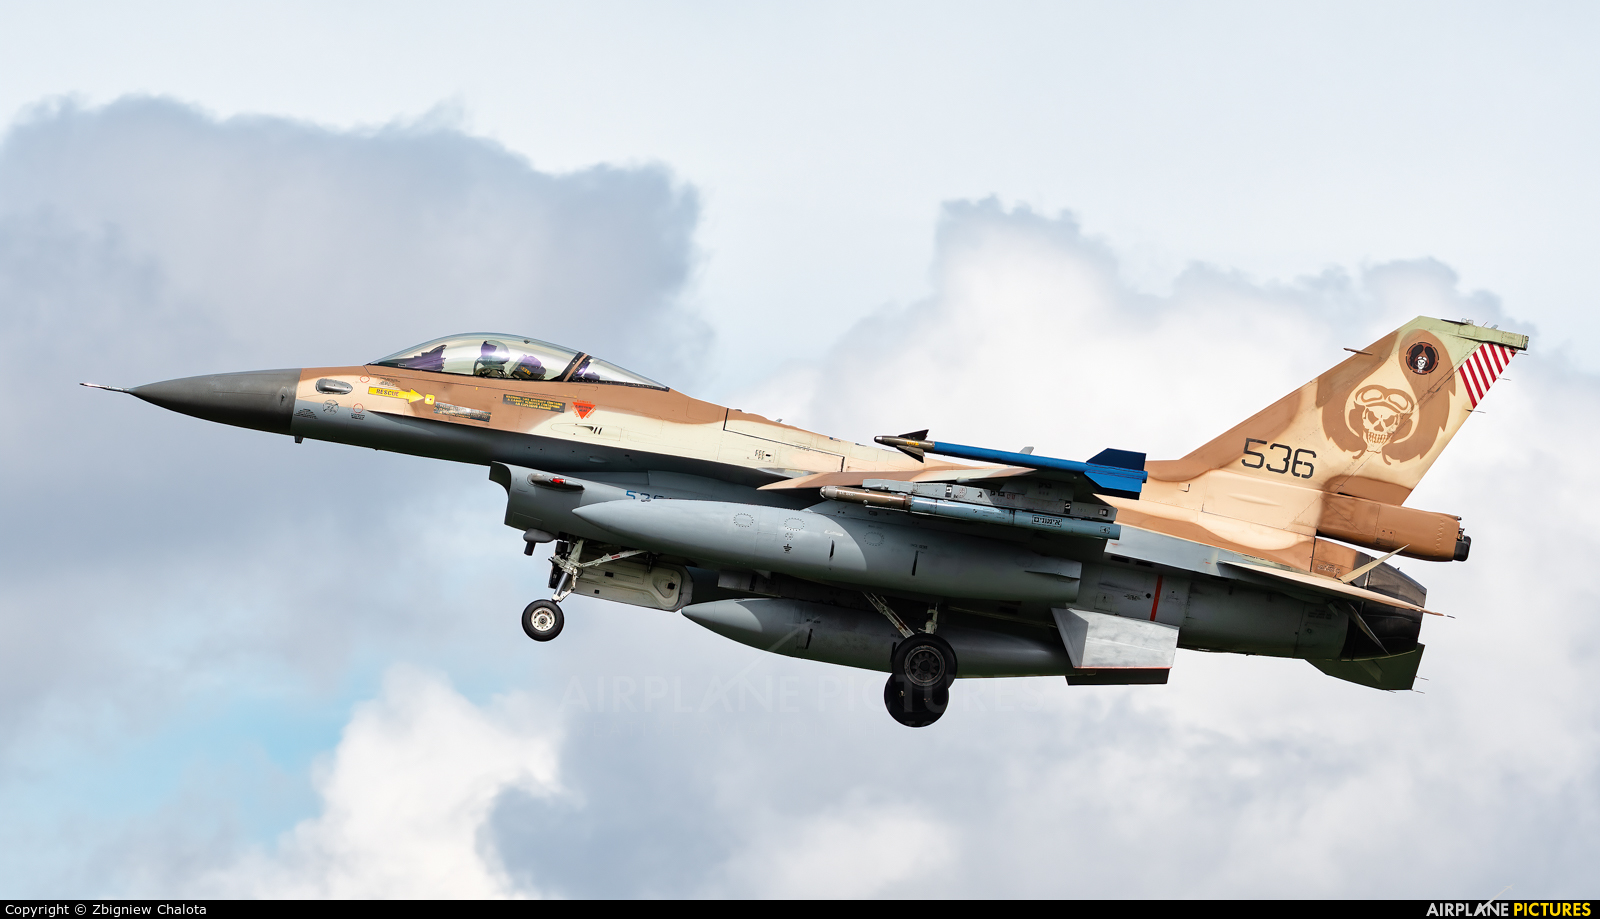 Israel - Defence Force 536 aircraft at Nörvenich